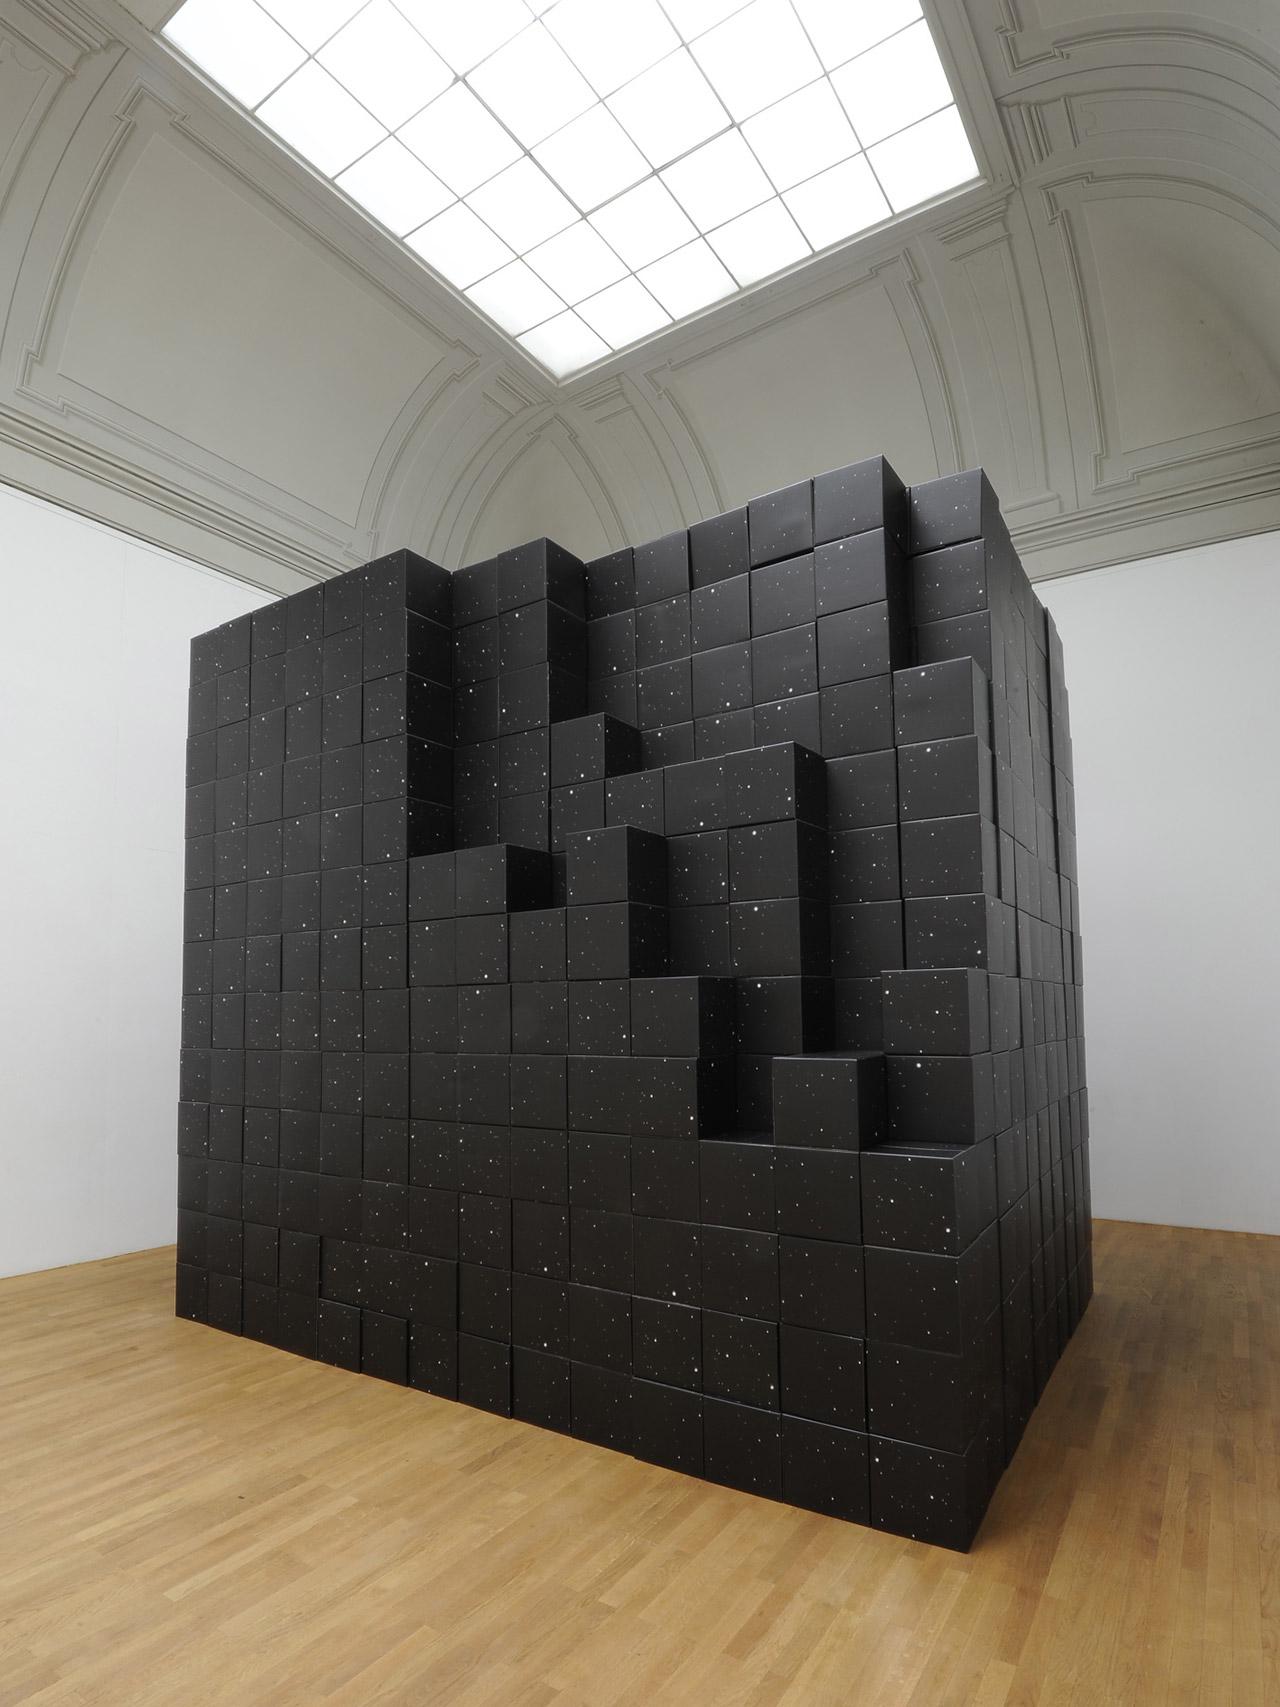 Alexander-Gutke-Kunsthalle-Winterthur-2013-4.jpg